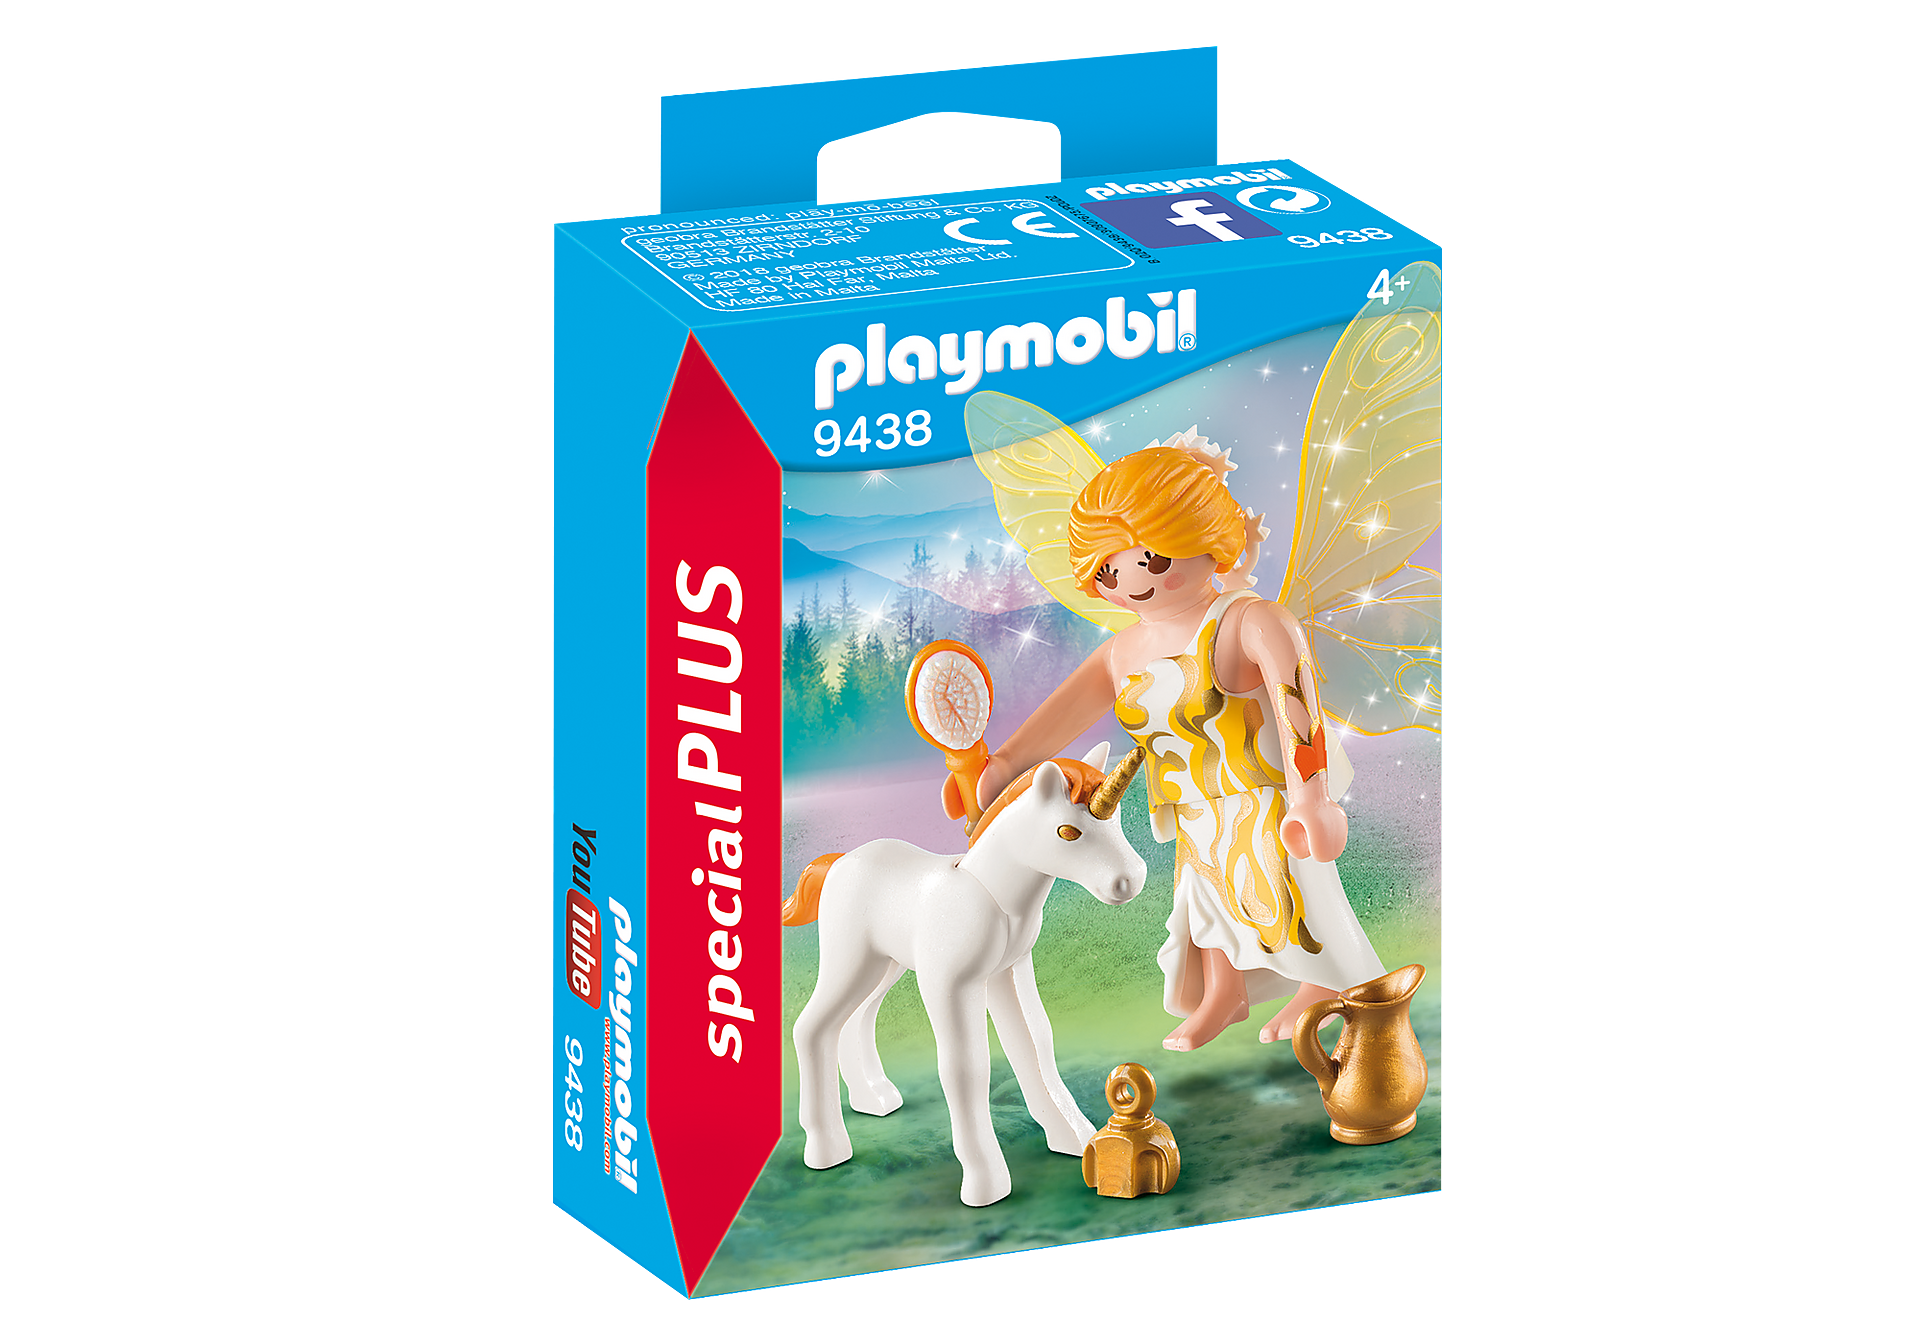 http://media.playmobil.com/i/playmobil/9438_product_box_front/Sonnenfee mit Einhornfohlen